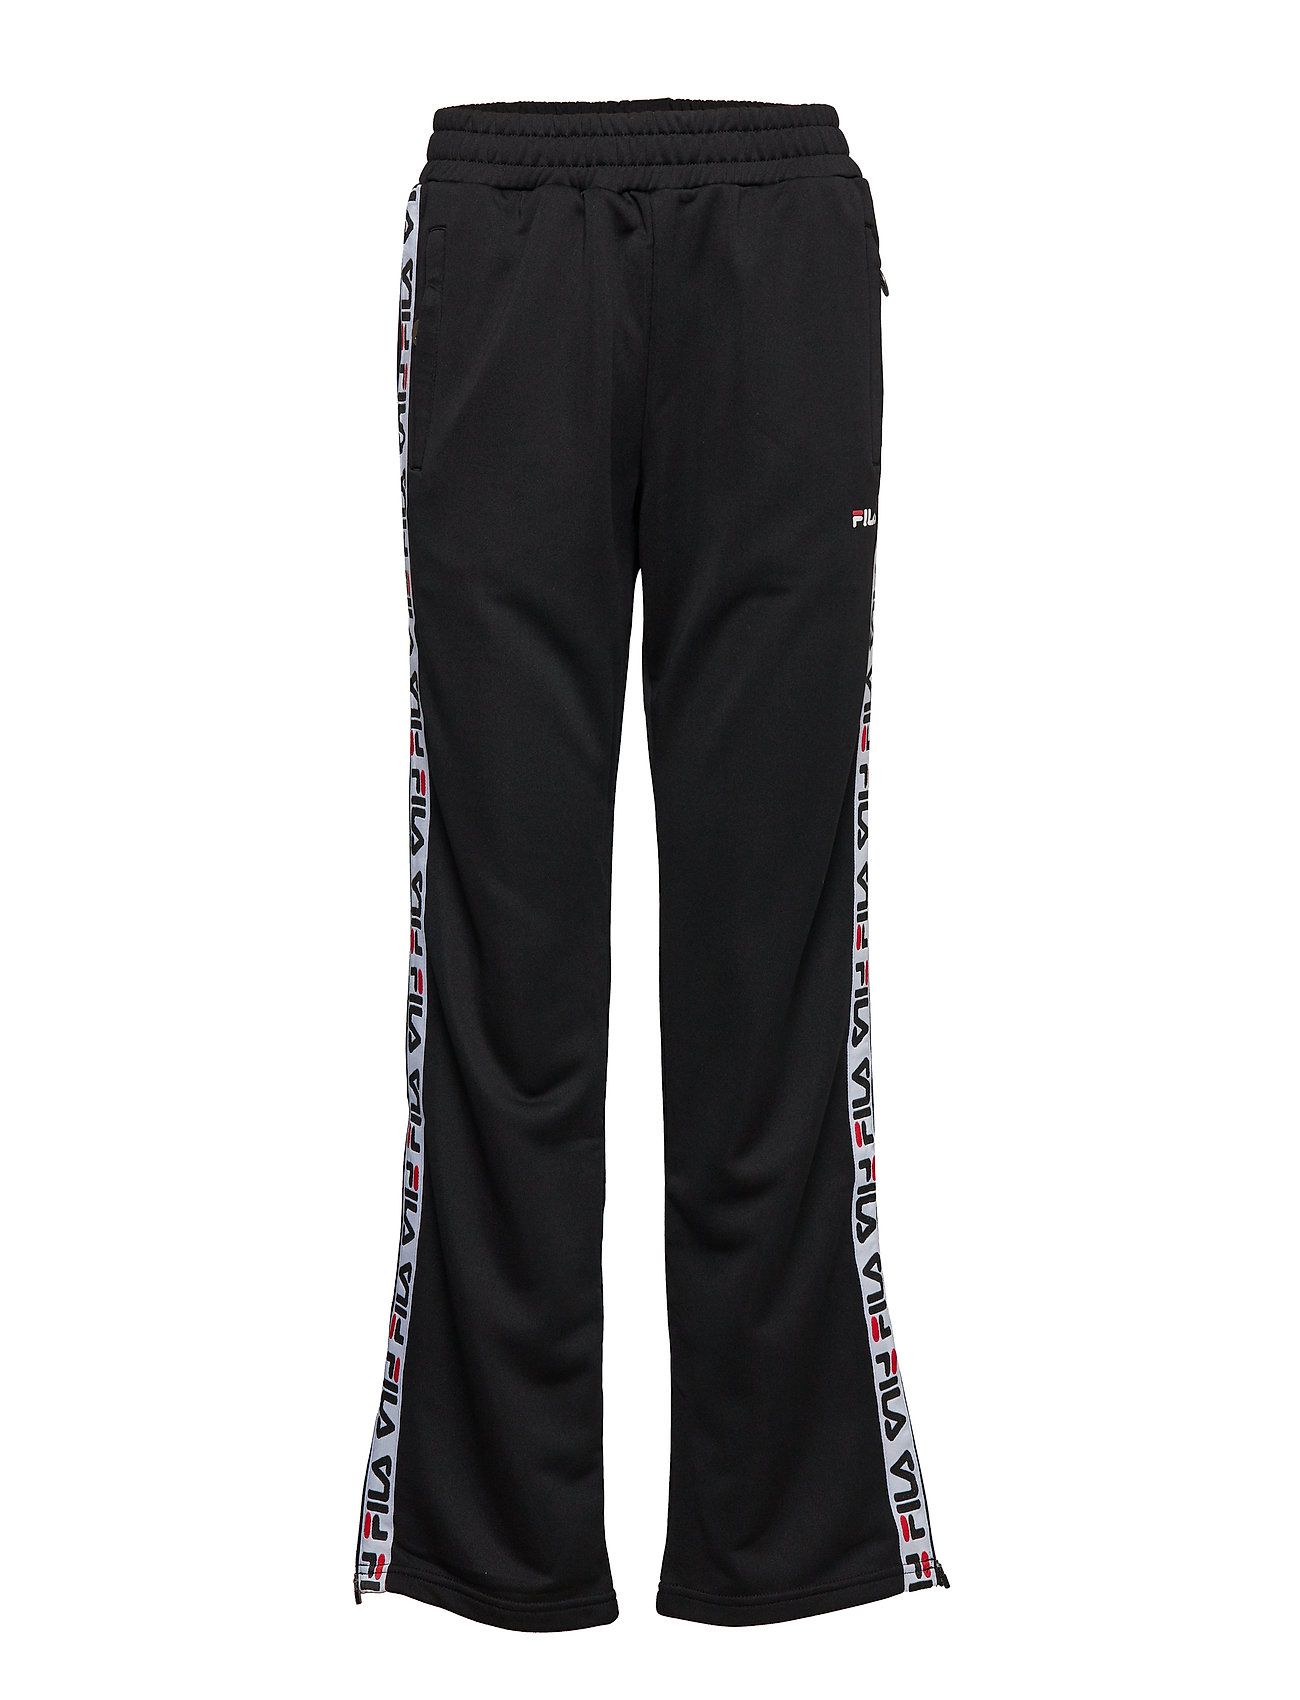 FILA WOMEN THORA track pants - BLACK